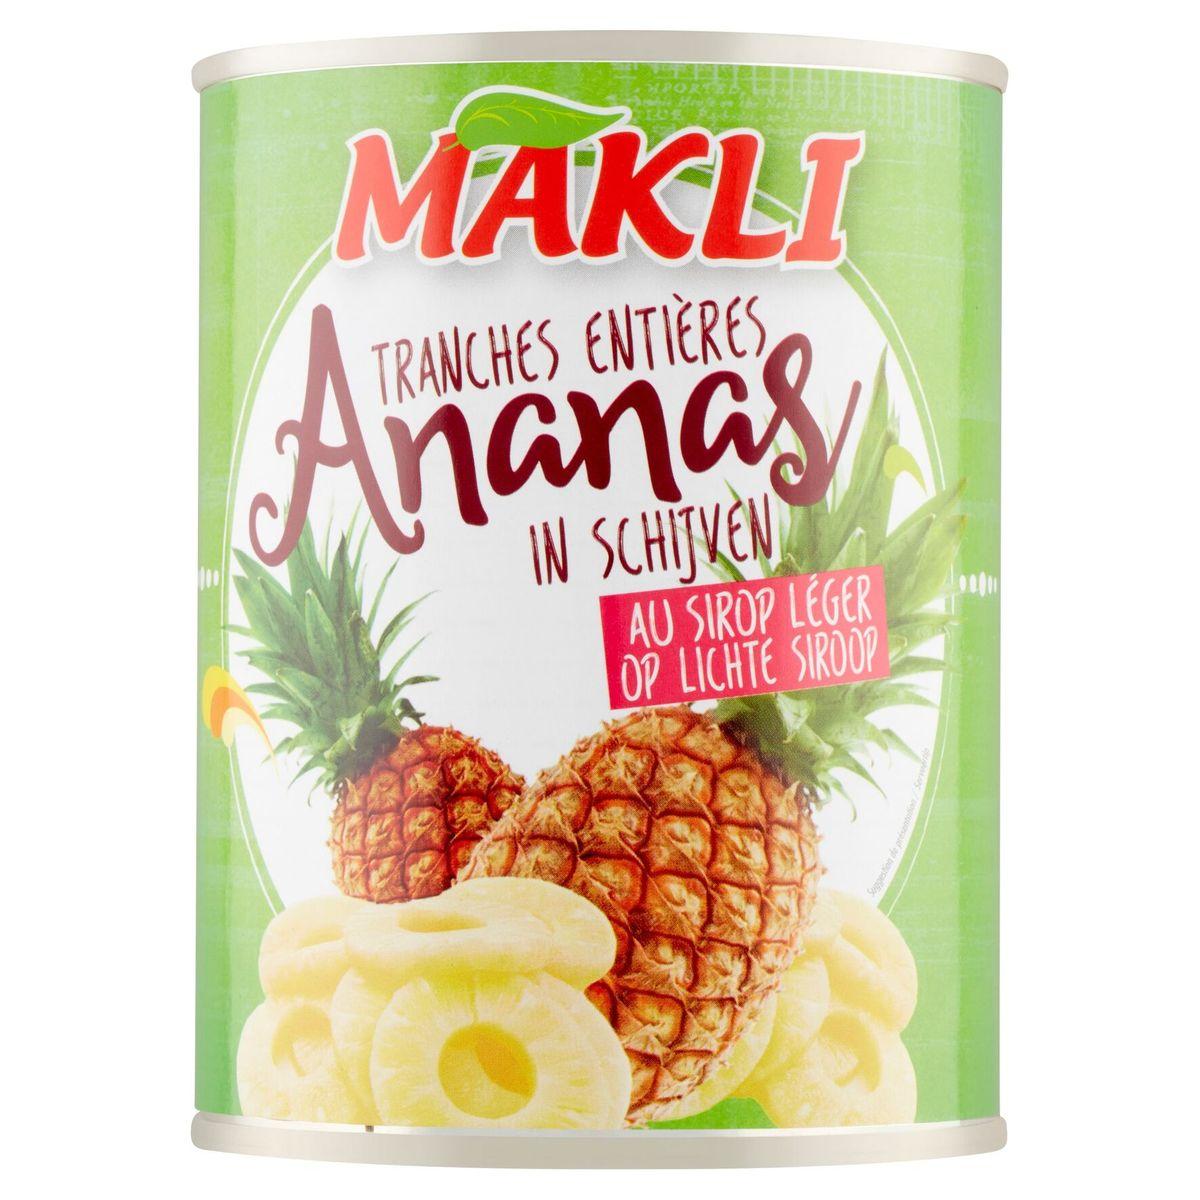 Makli Tranches Entières Ananas au Sirop Léger 565 g